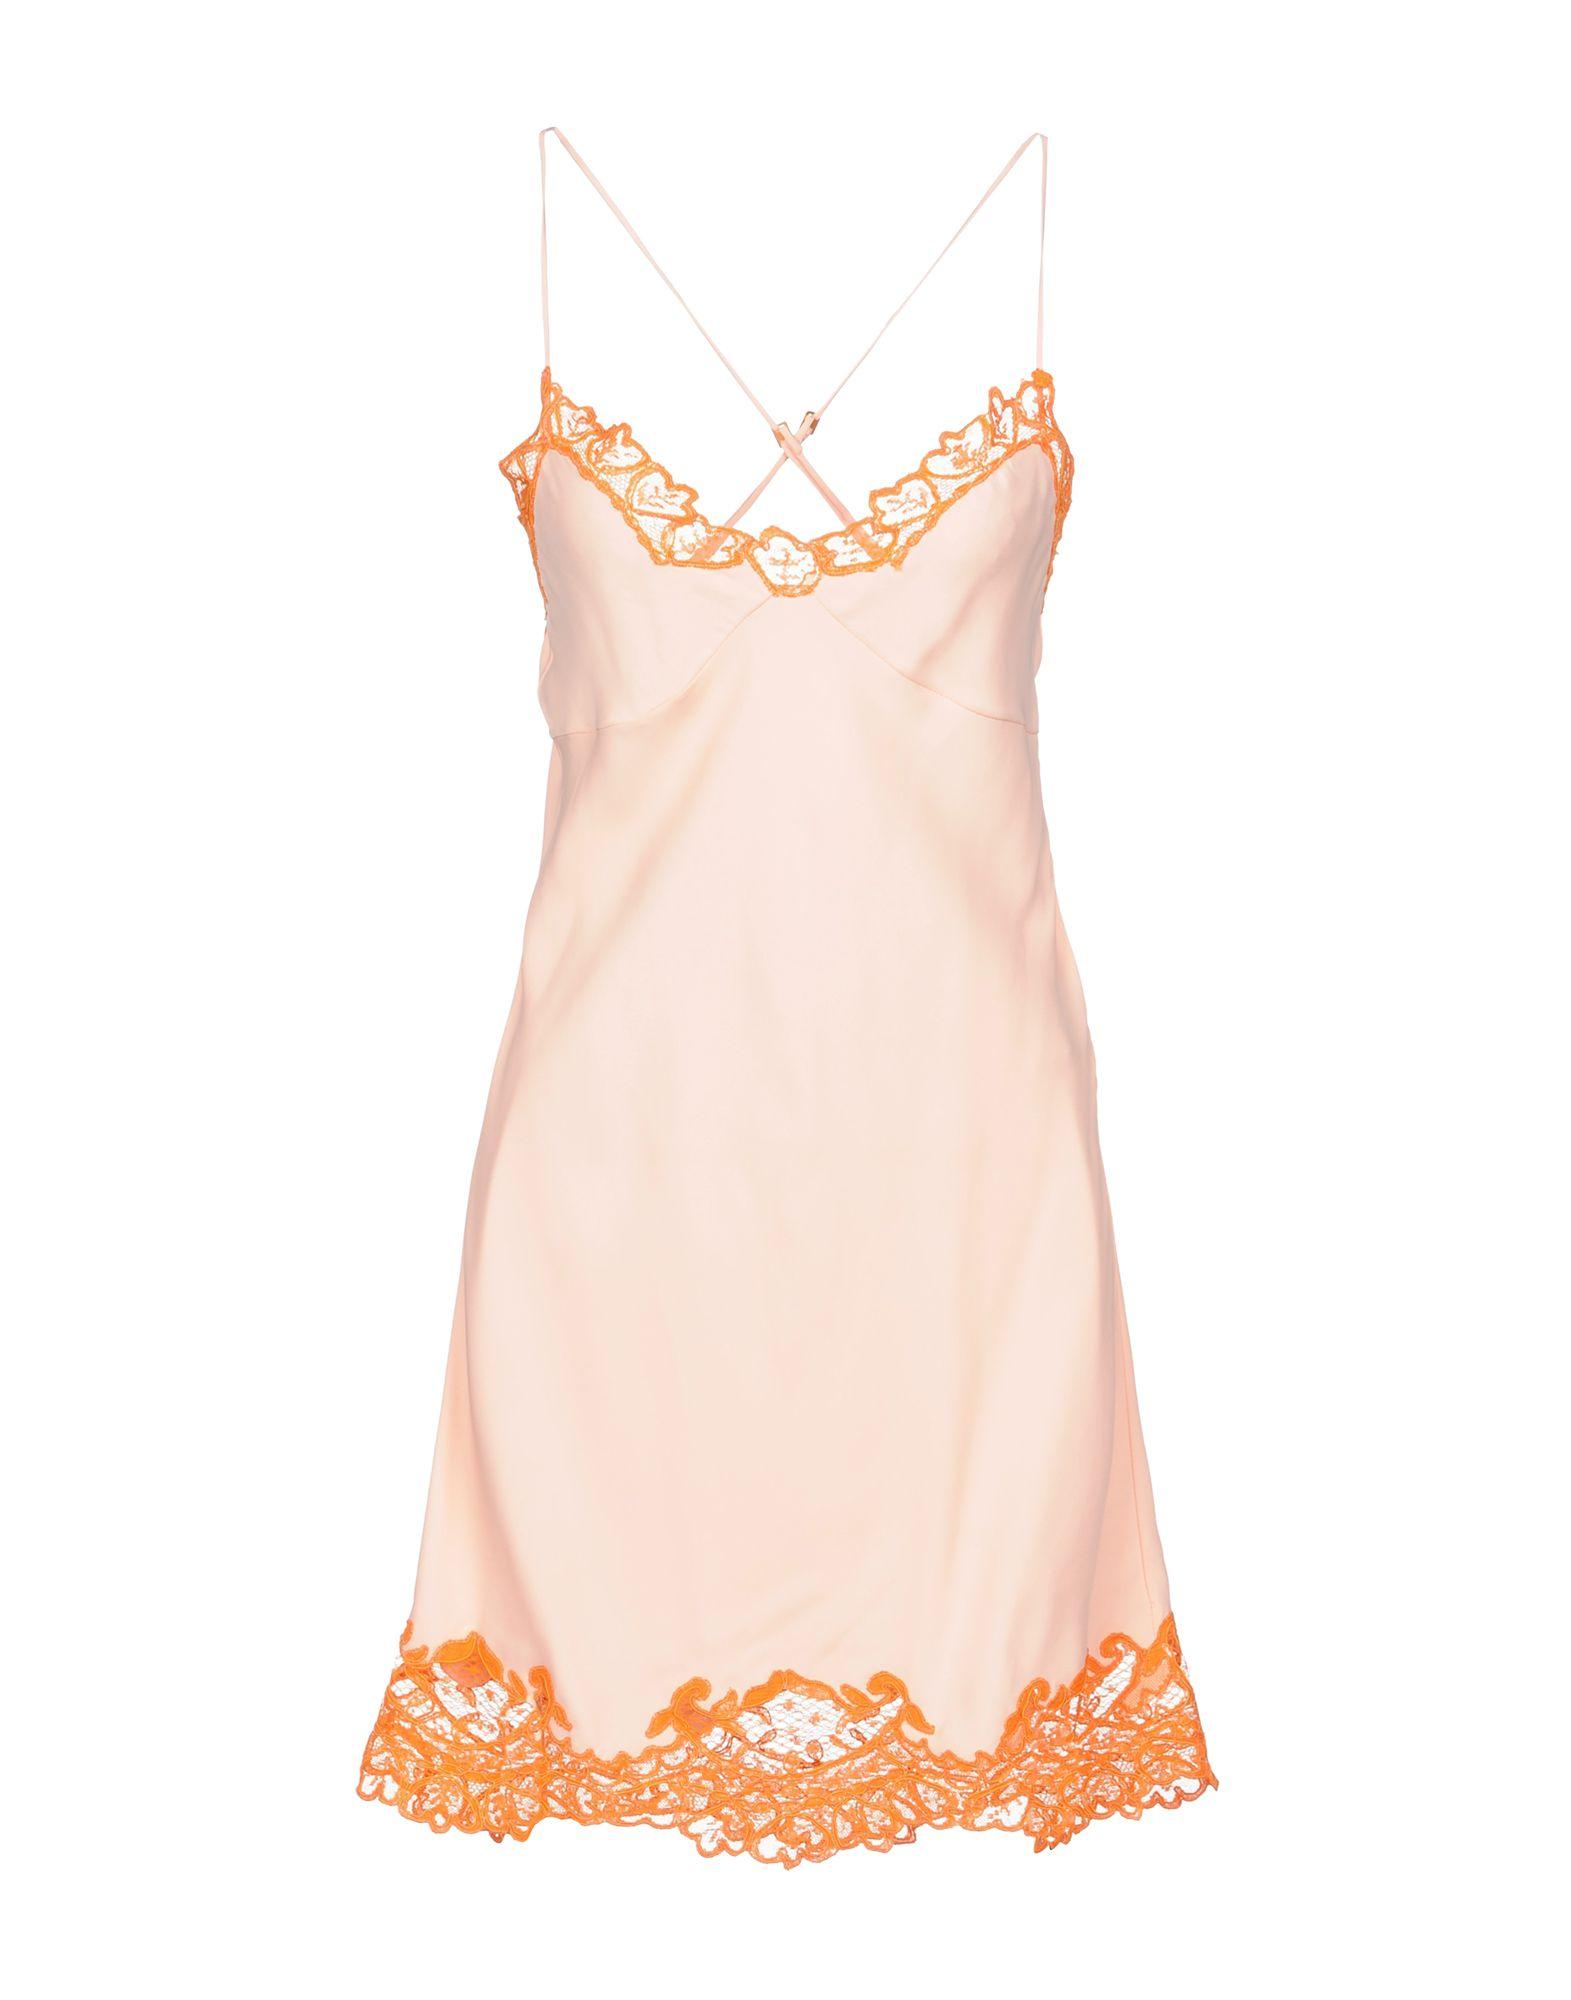 Vestito Corto Versace Donna - Acquista online su UwHBxwMT